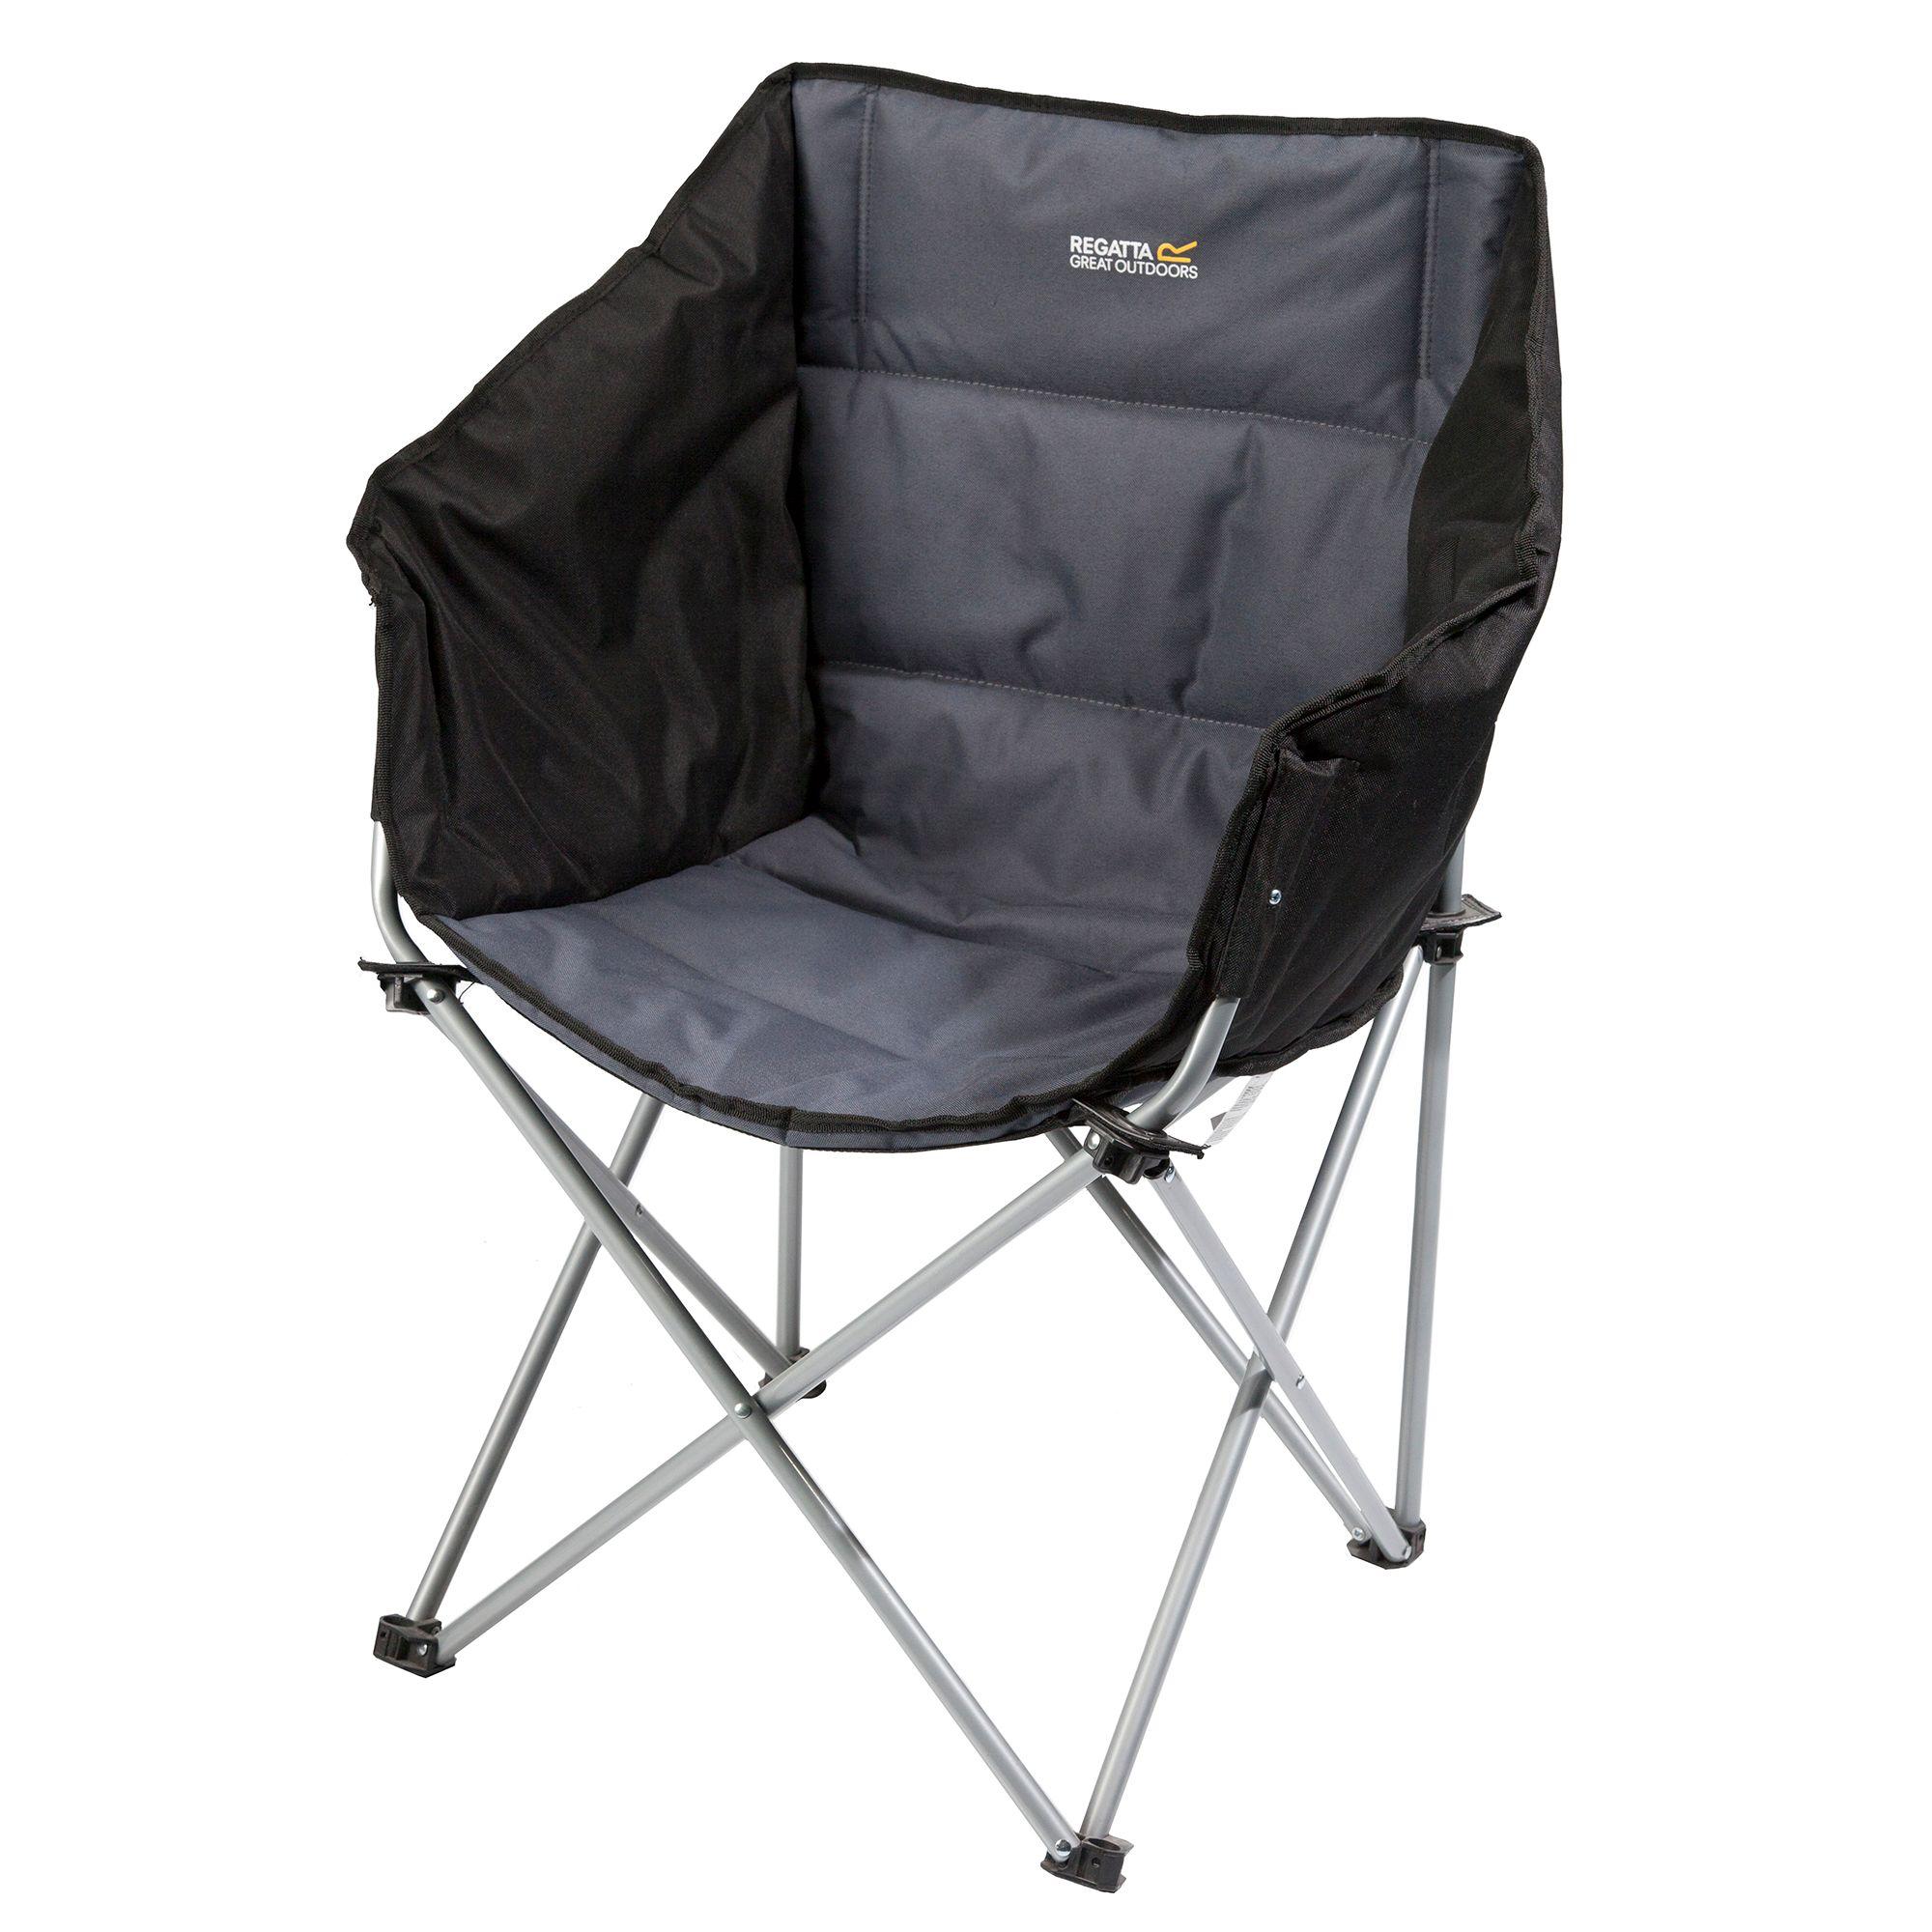 regatta navas lightweight folding camping chair with storage bag